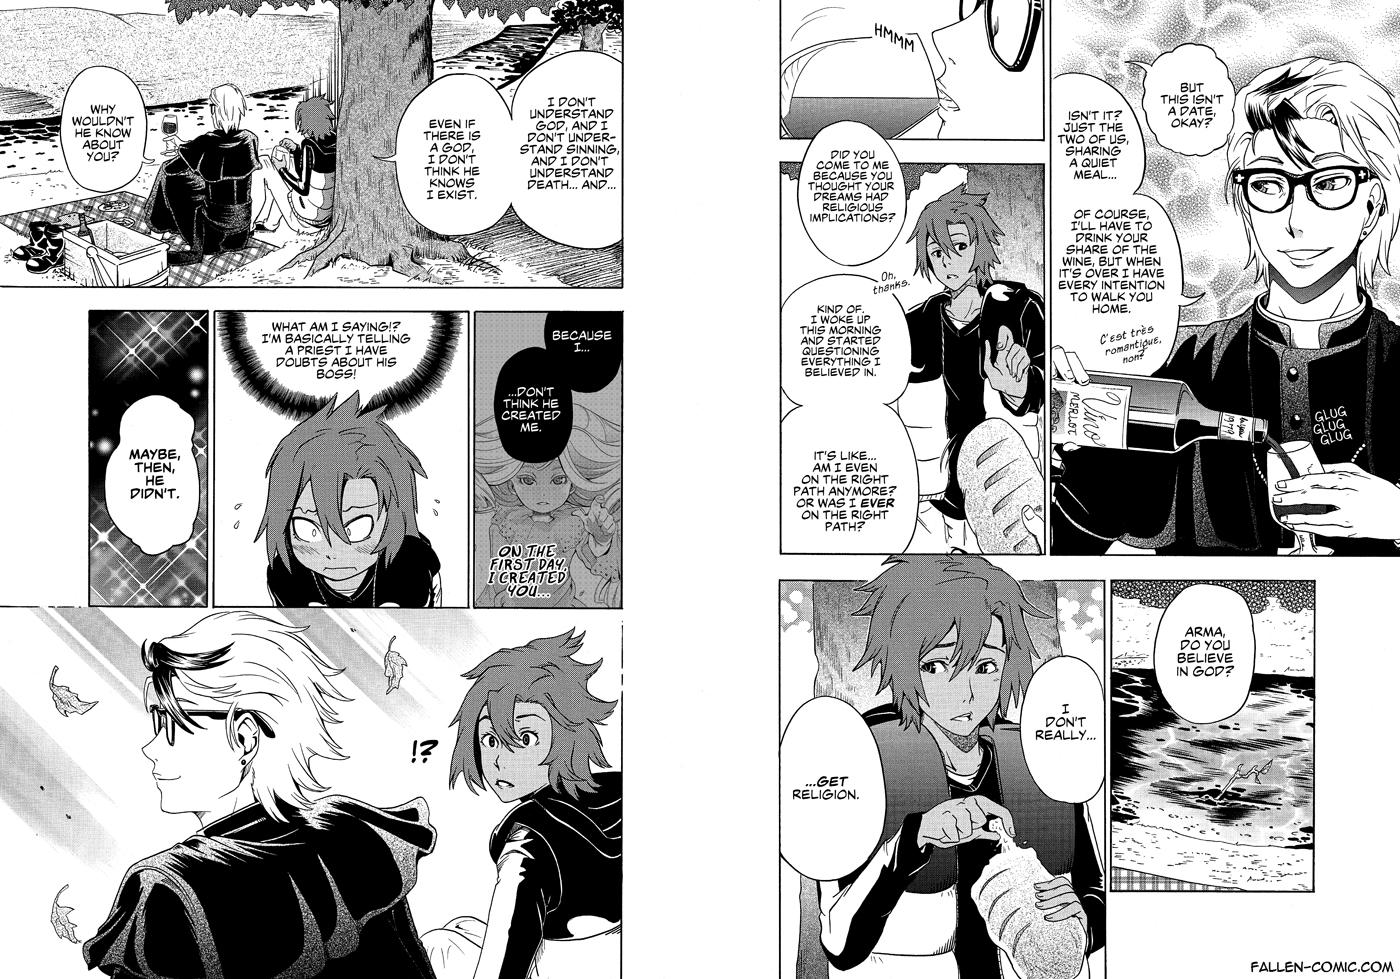 FaLLEN Chapter 13 Pages 14-15 by OgawaBurukku